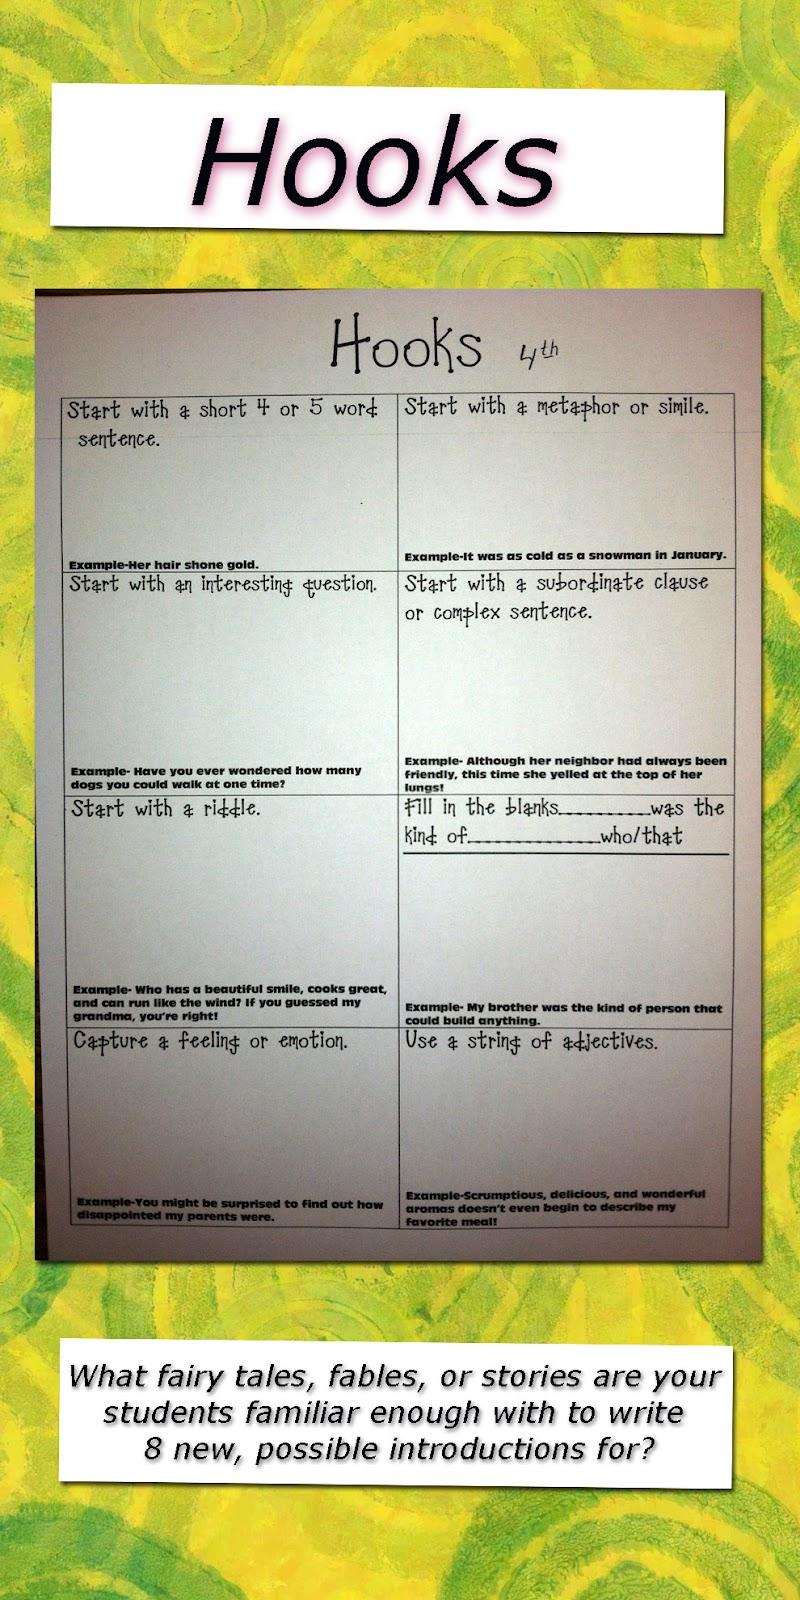 Social issue classification essay